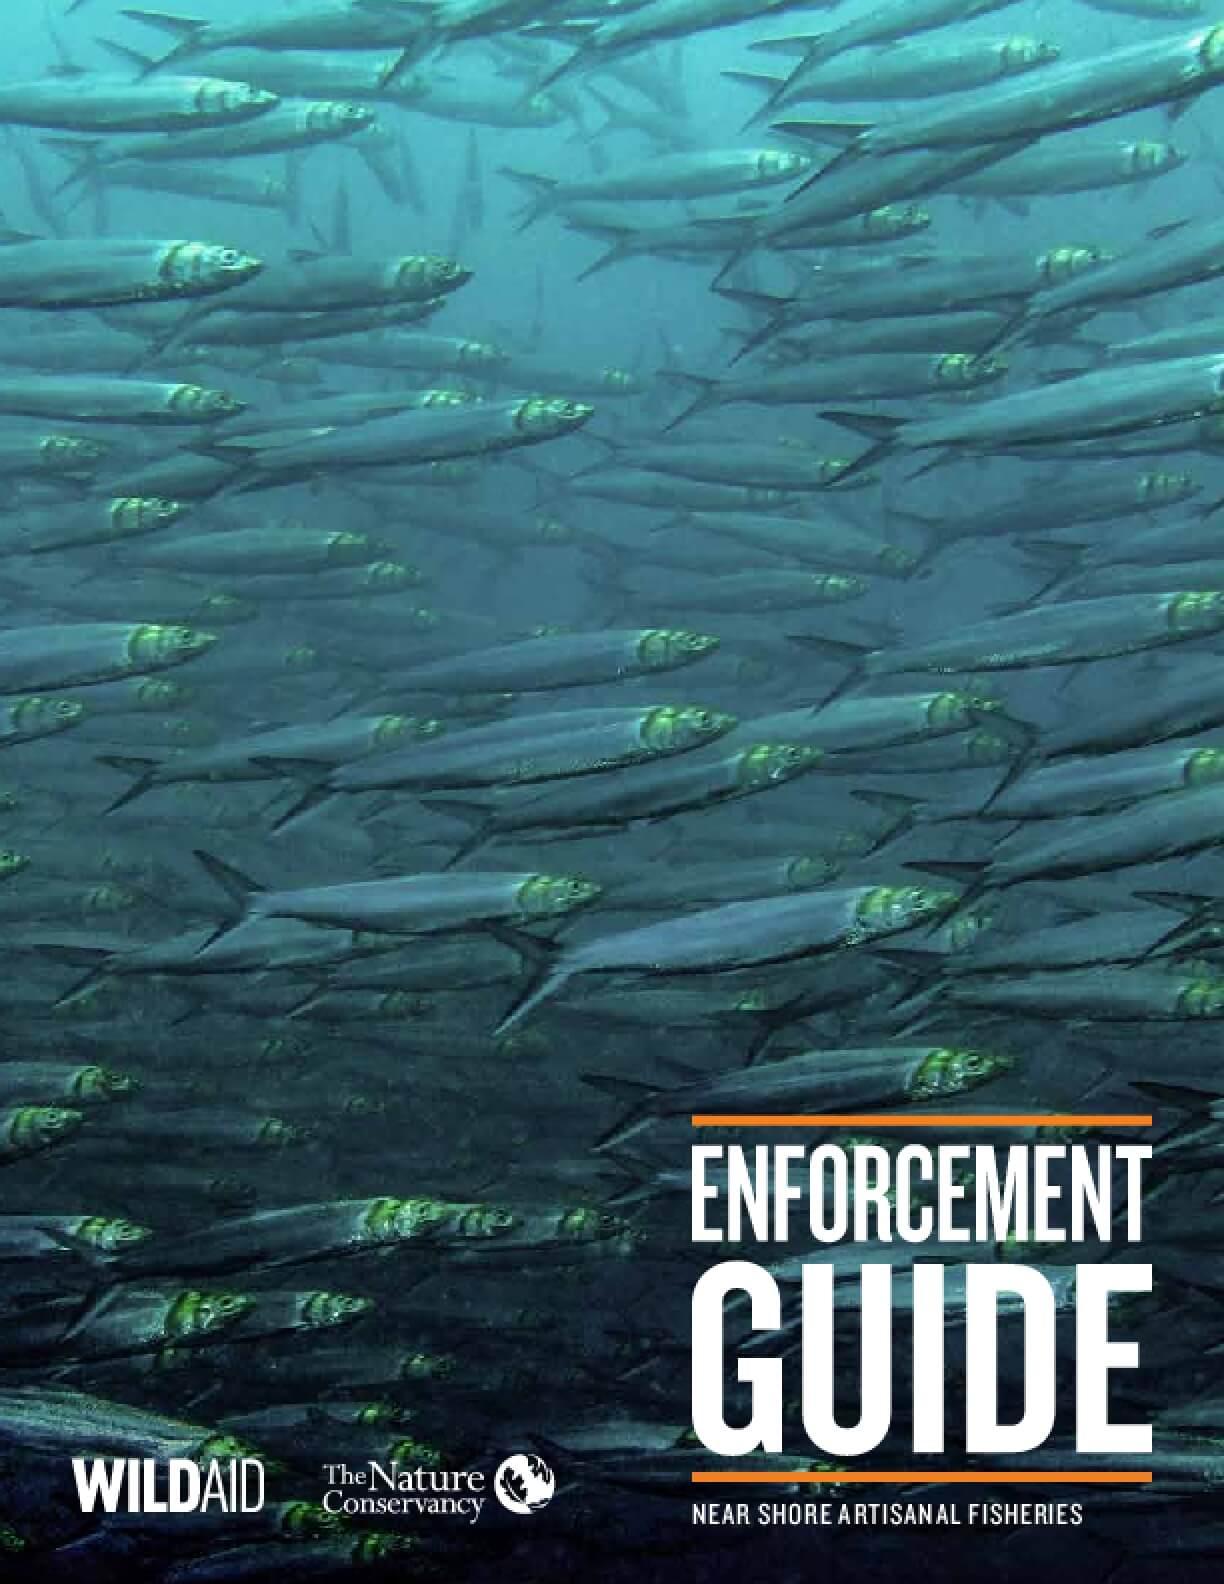 Enforcement Guide: Near Shore Artisanal Fisheries